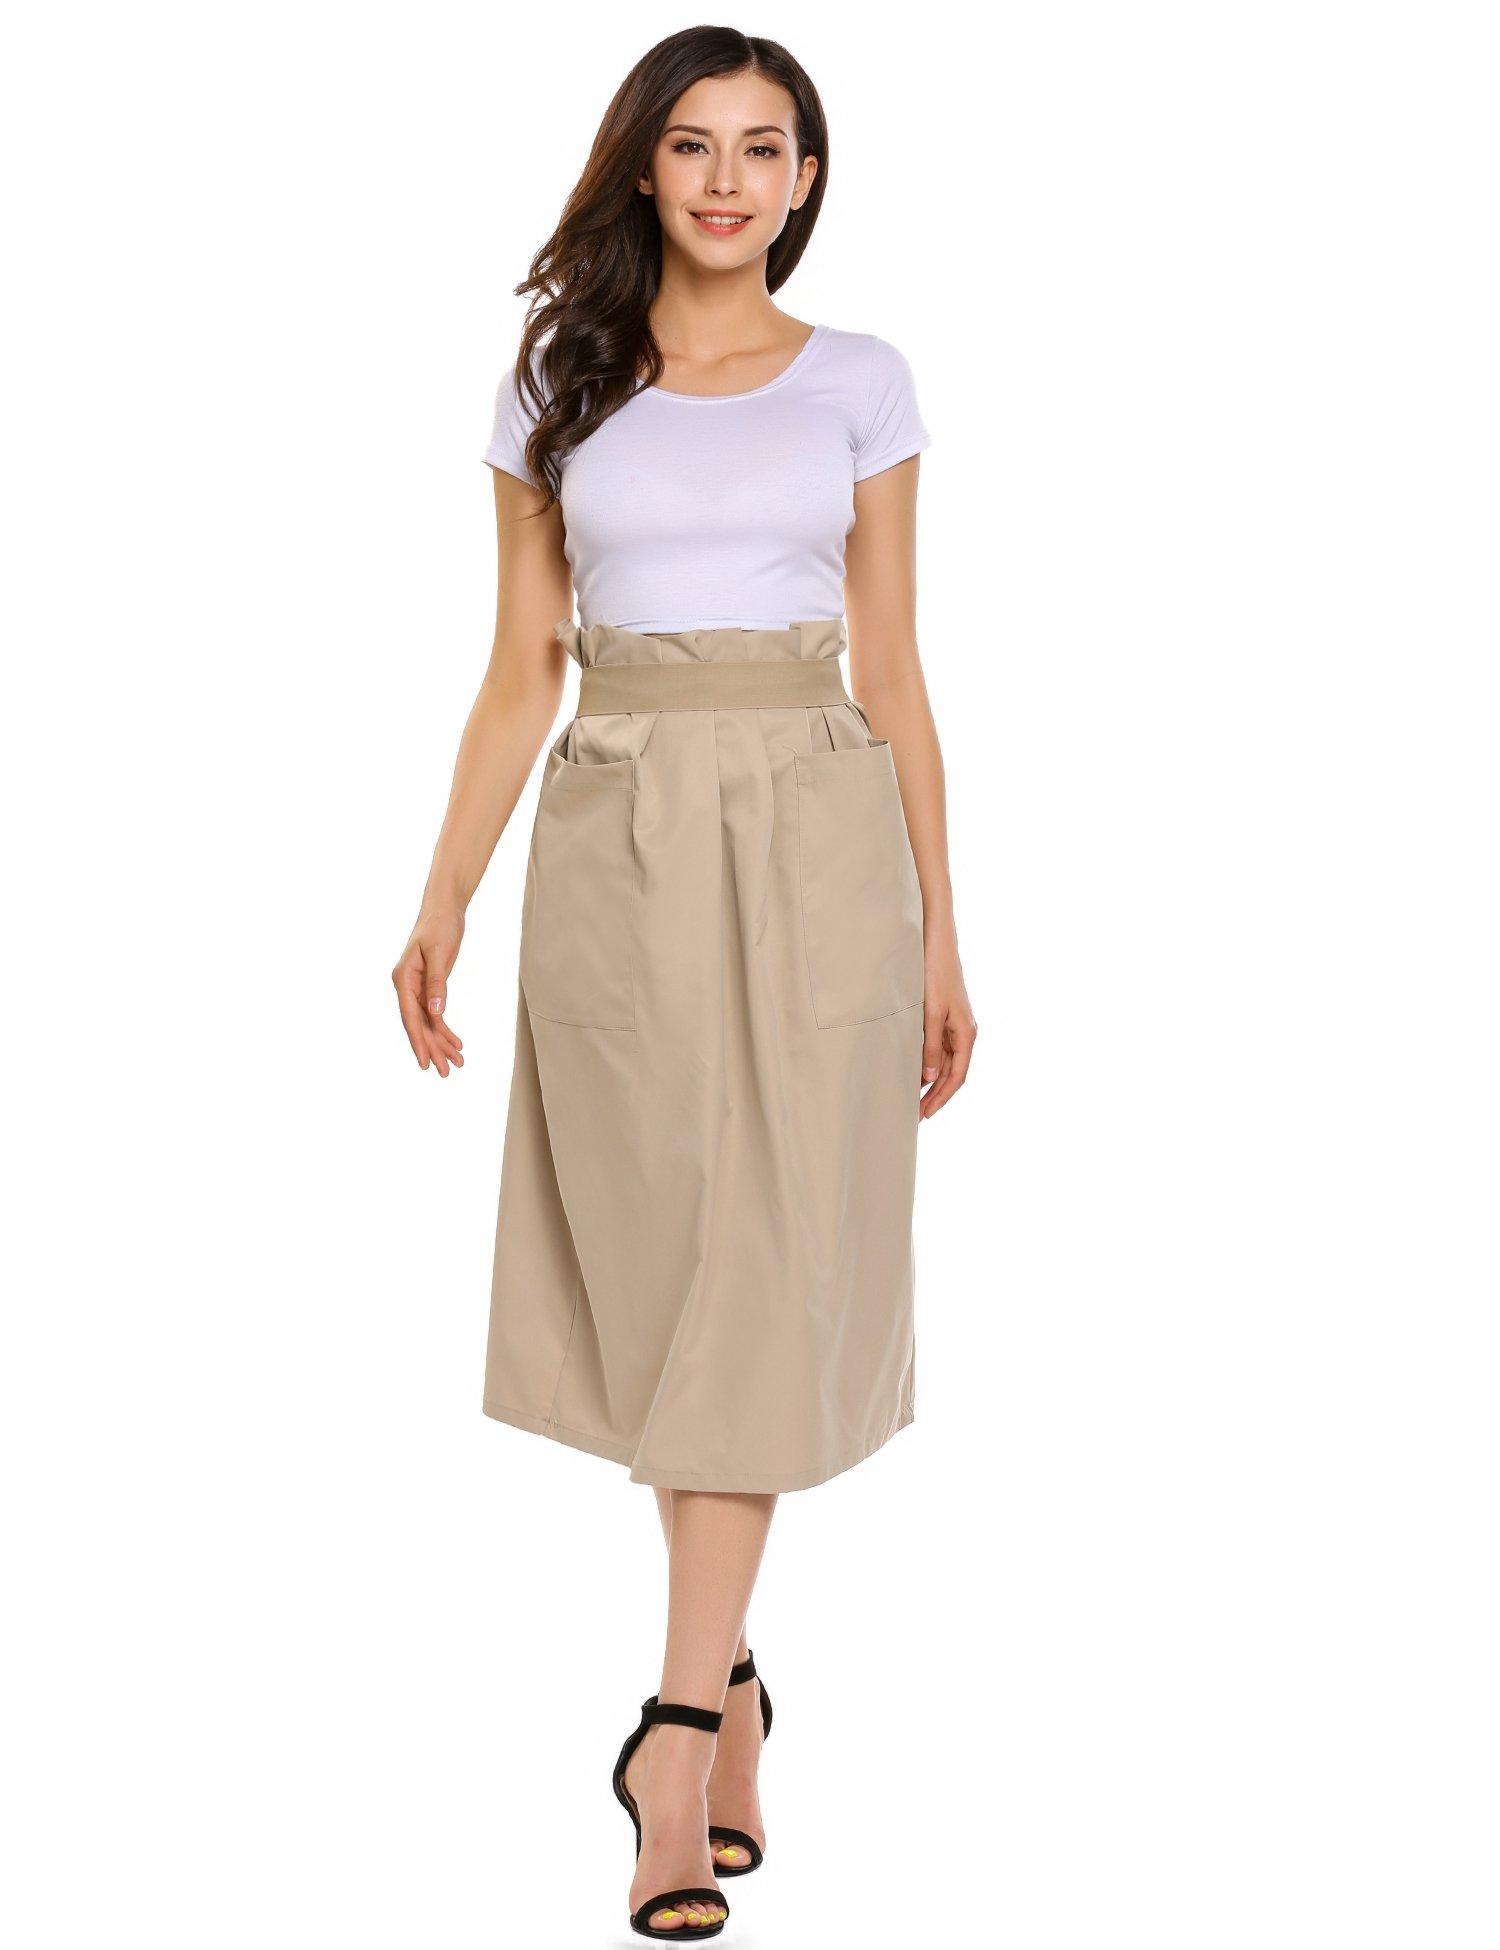 Women's High Waist Bodycon Split Front Pencil Skirts Khaki Small